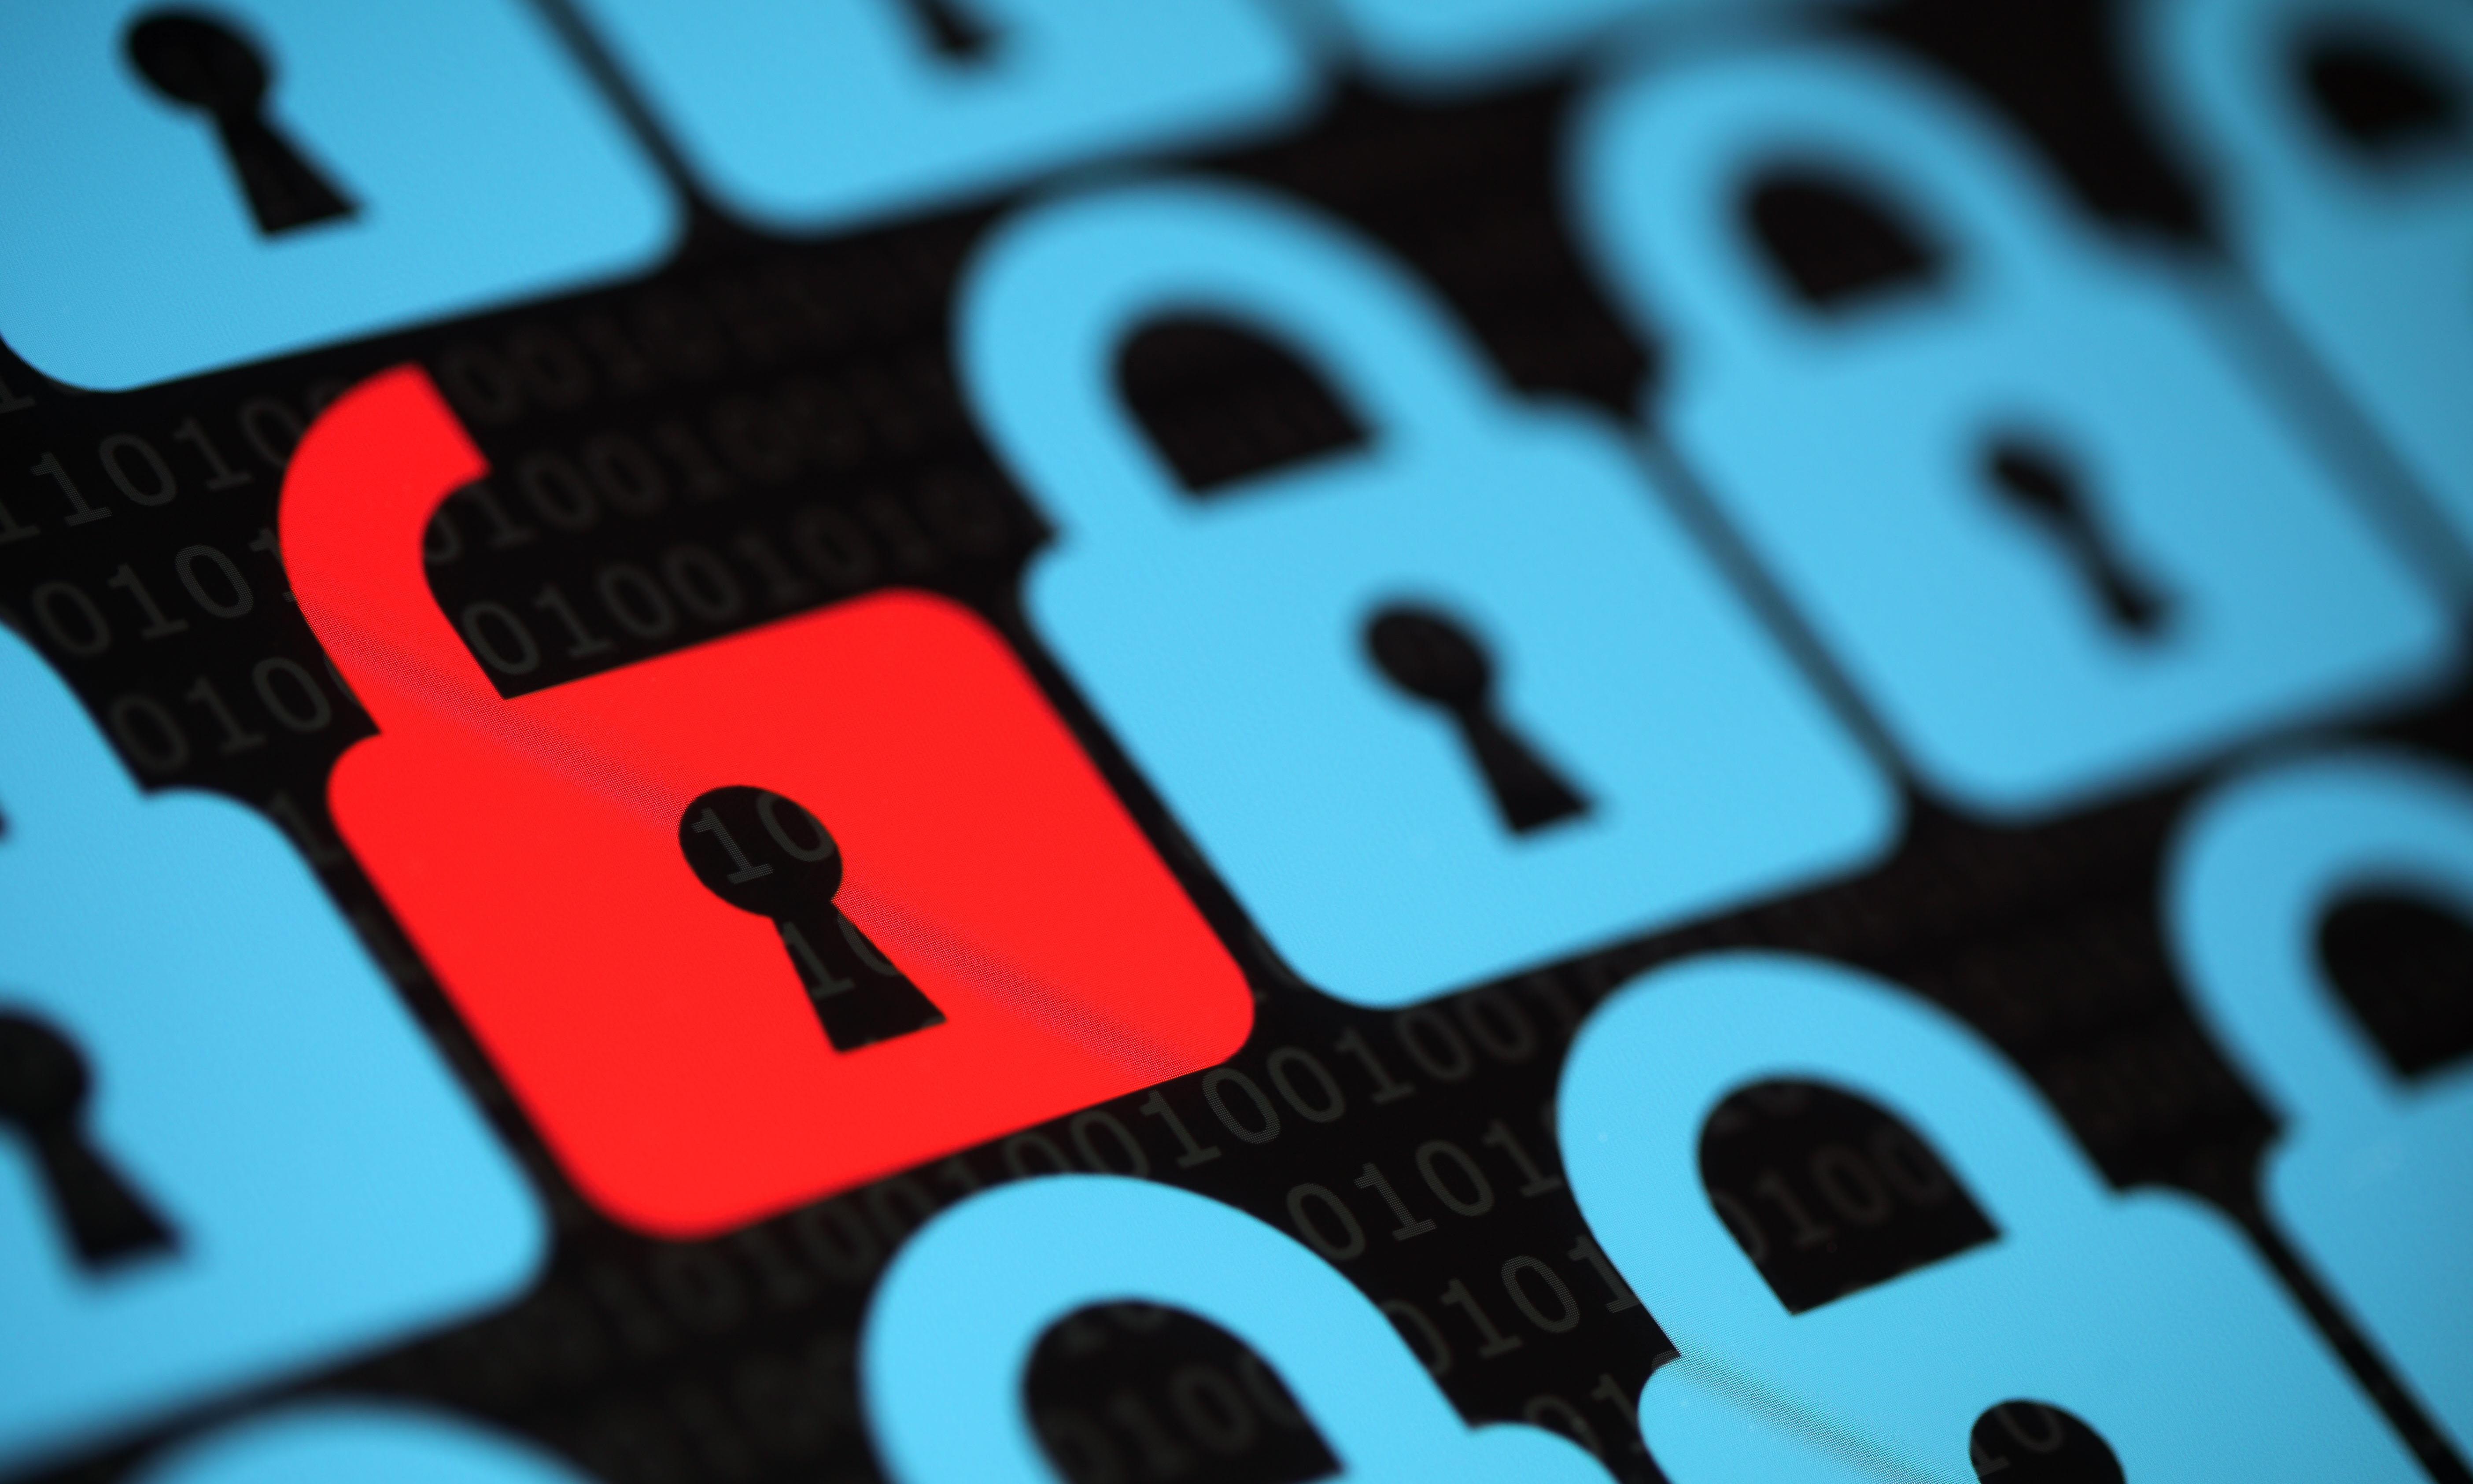 Australian internet providers told to block websites hosting Christchurch terror video